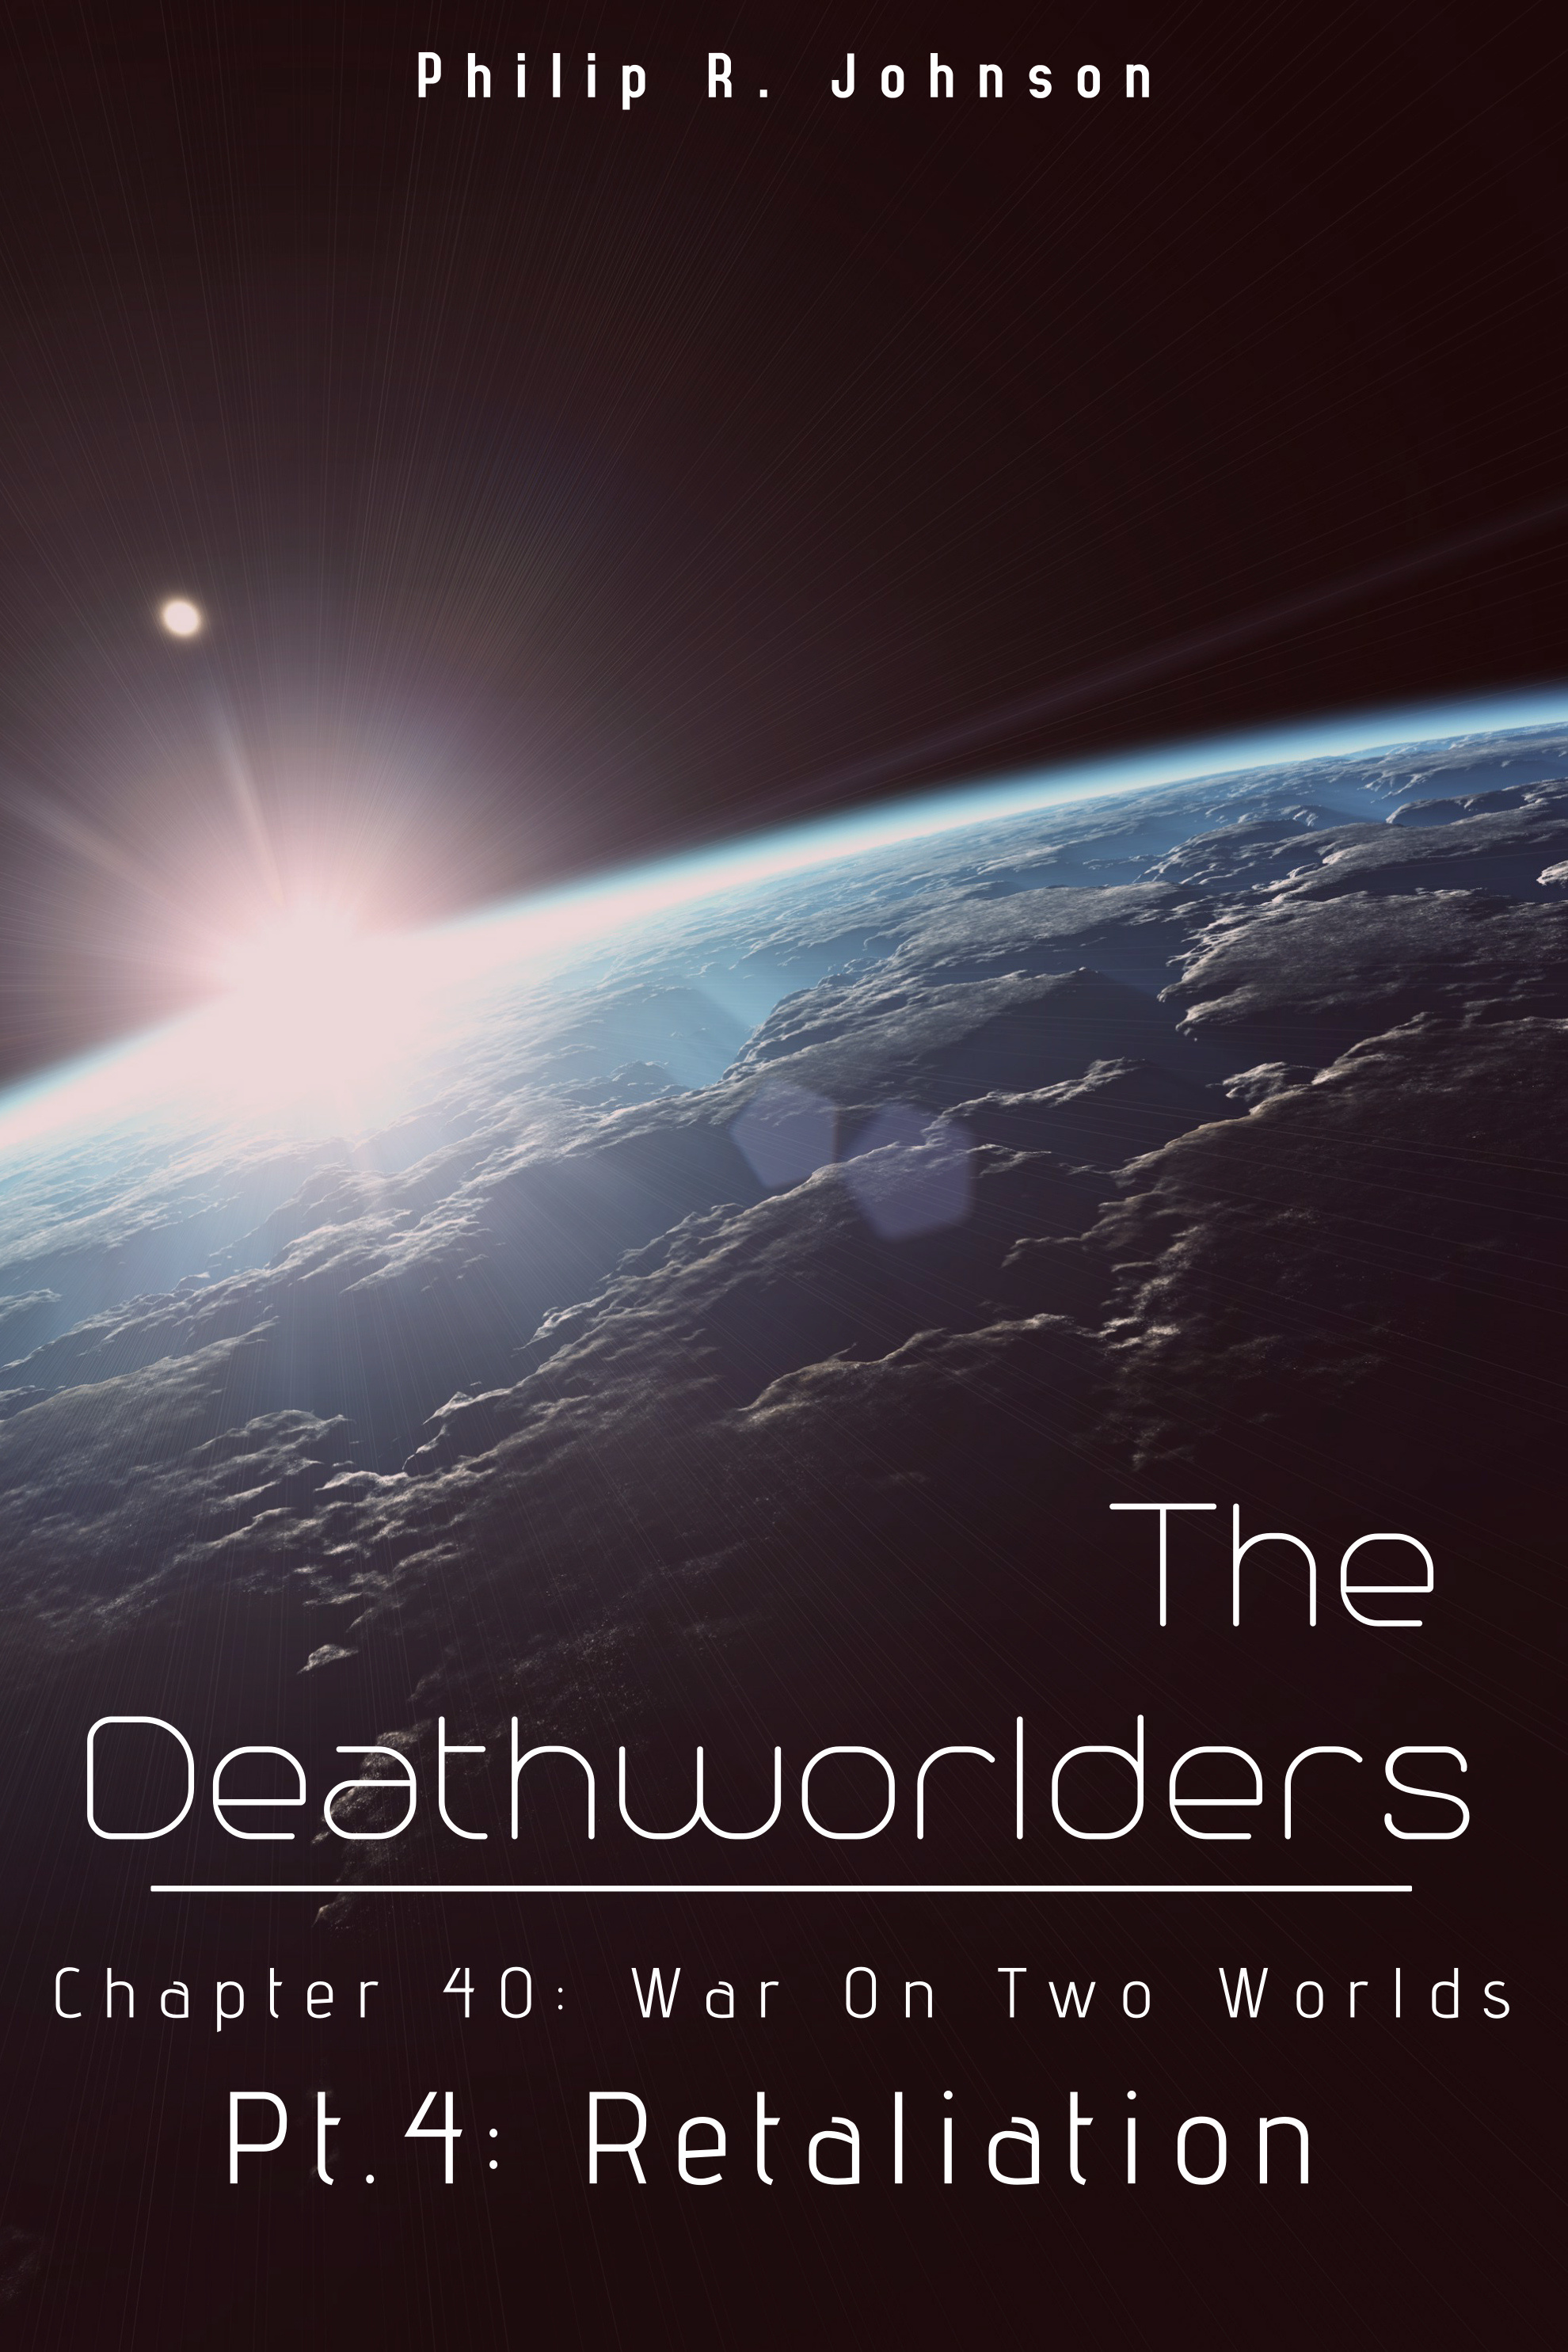 Chapter 40: War on Two Worlds, Part 4—Retaliation